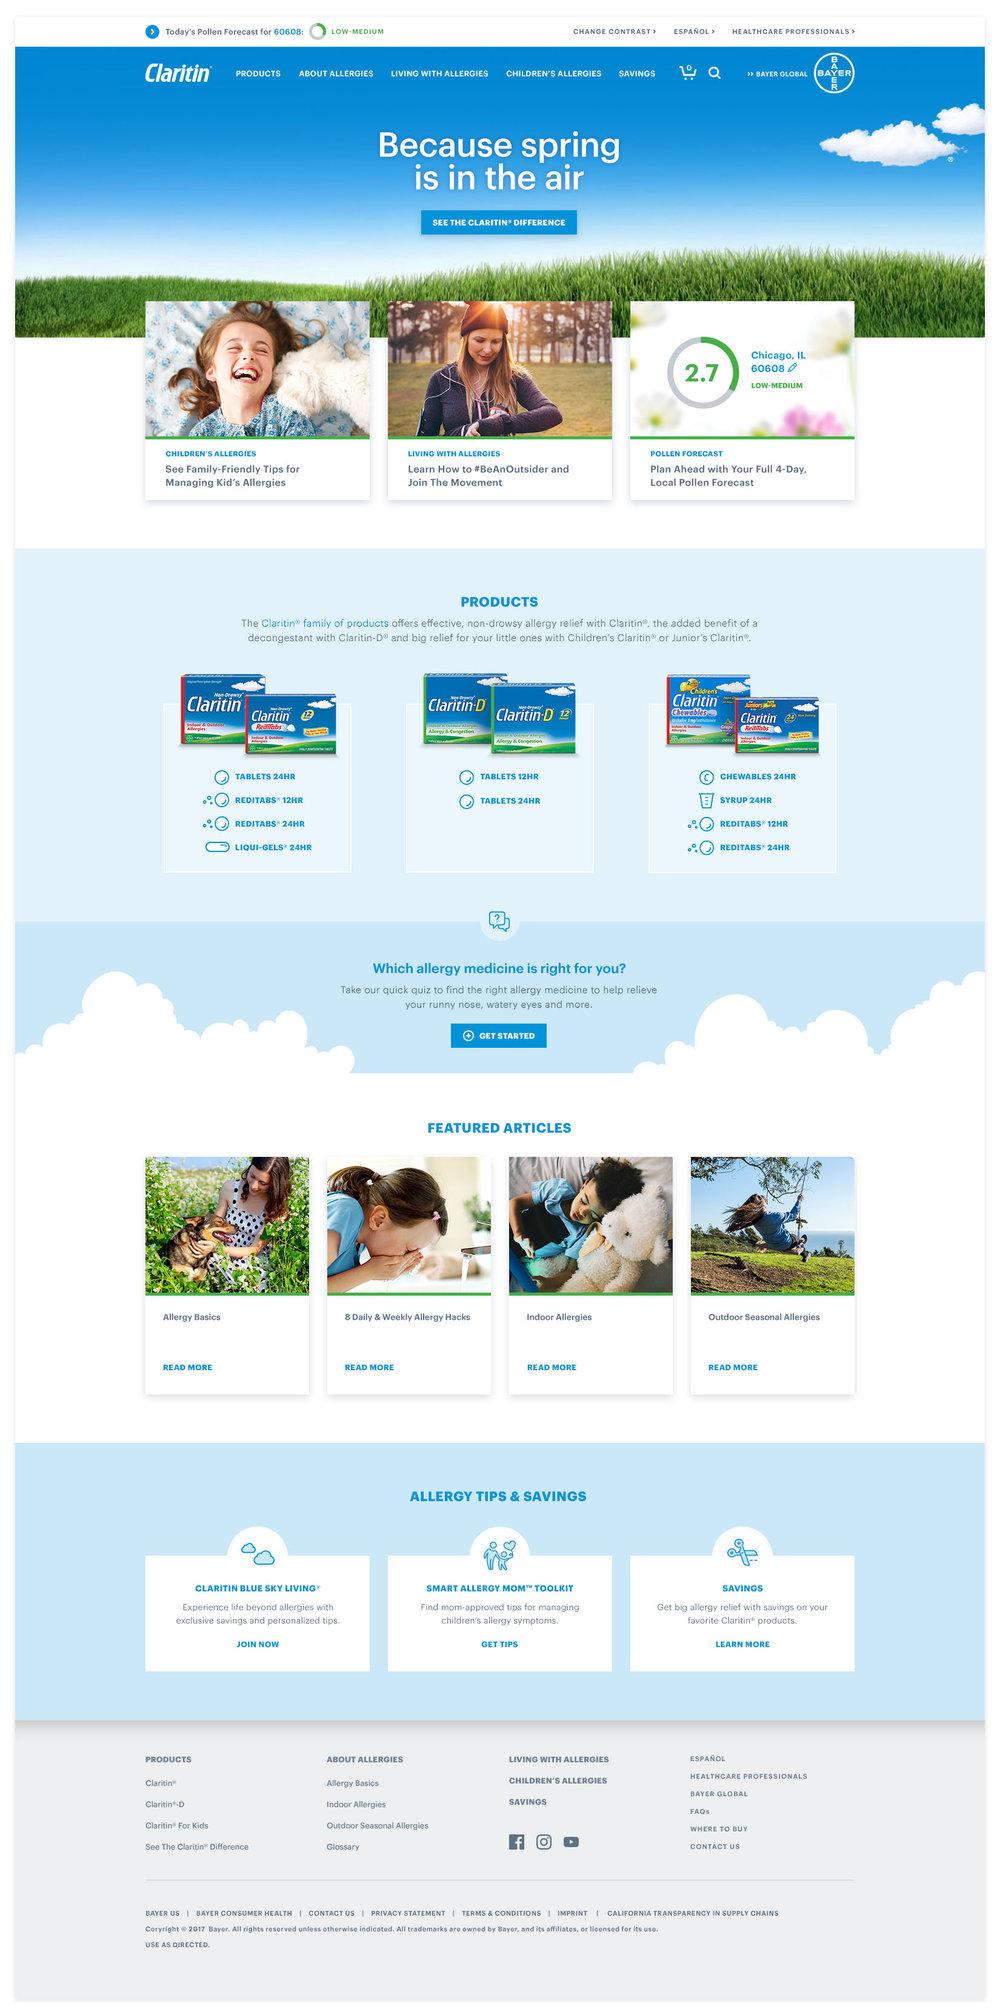 claritin_homepage.jpg